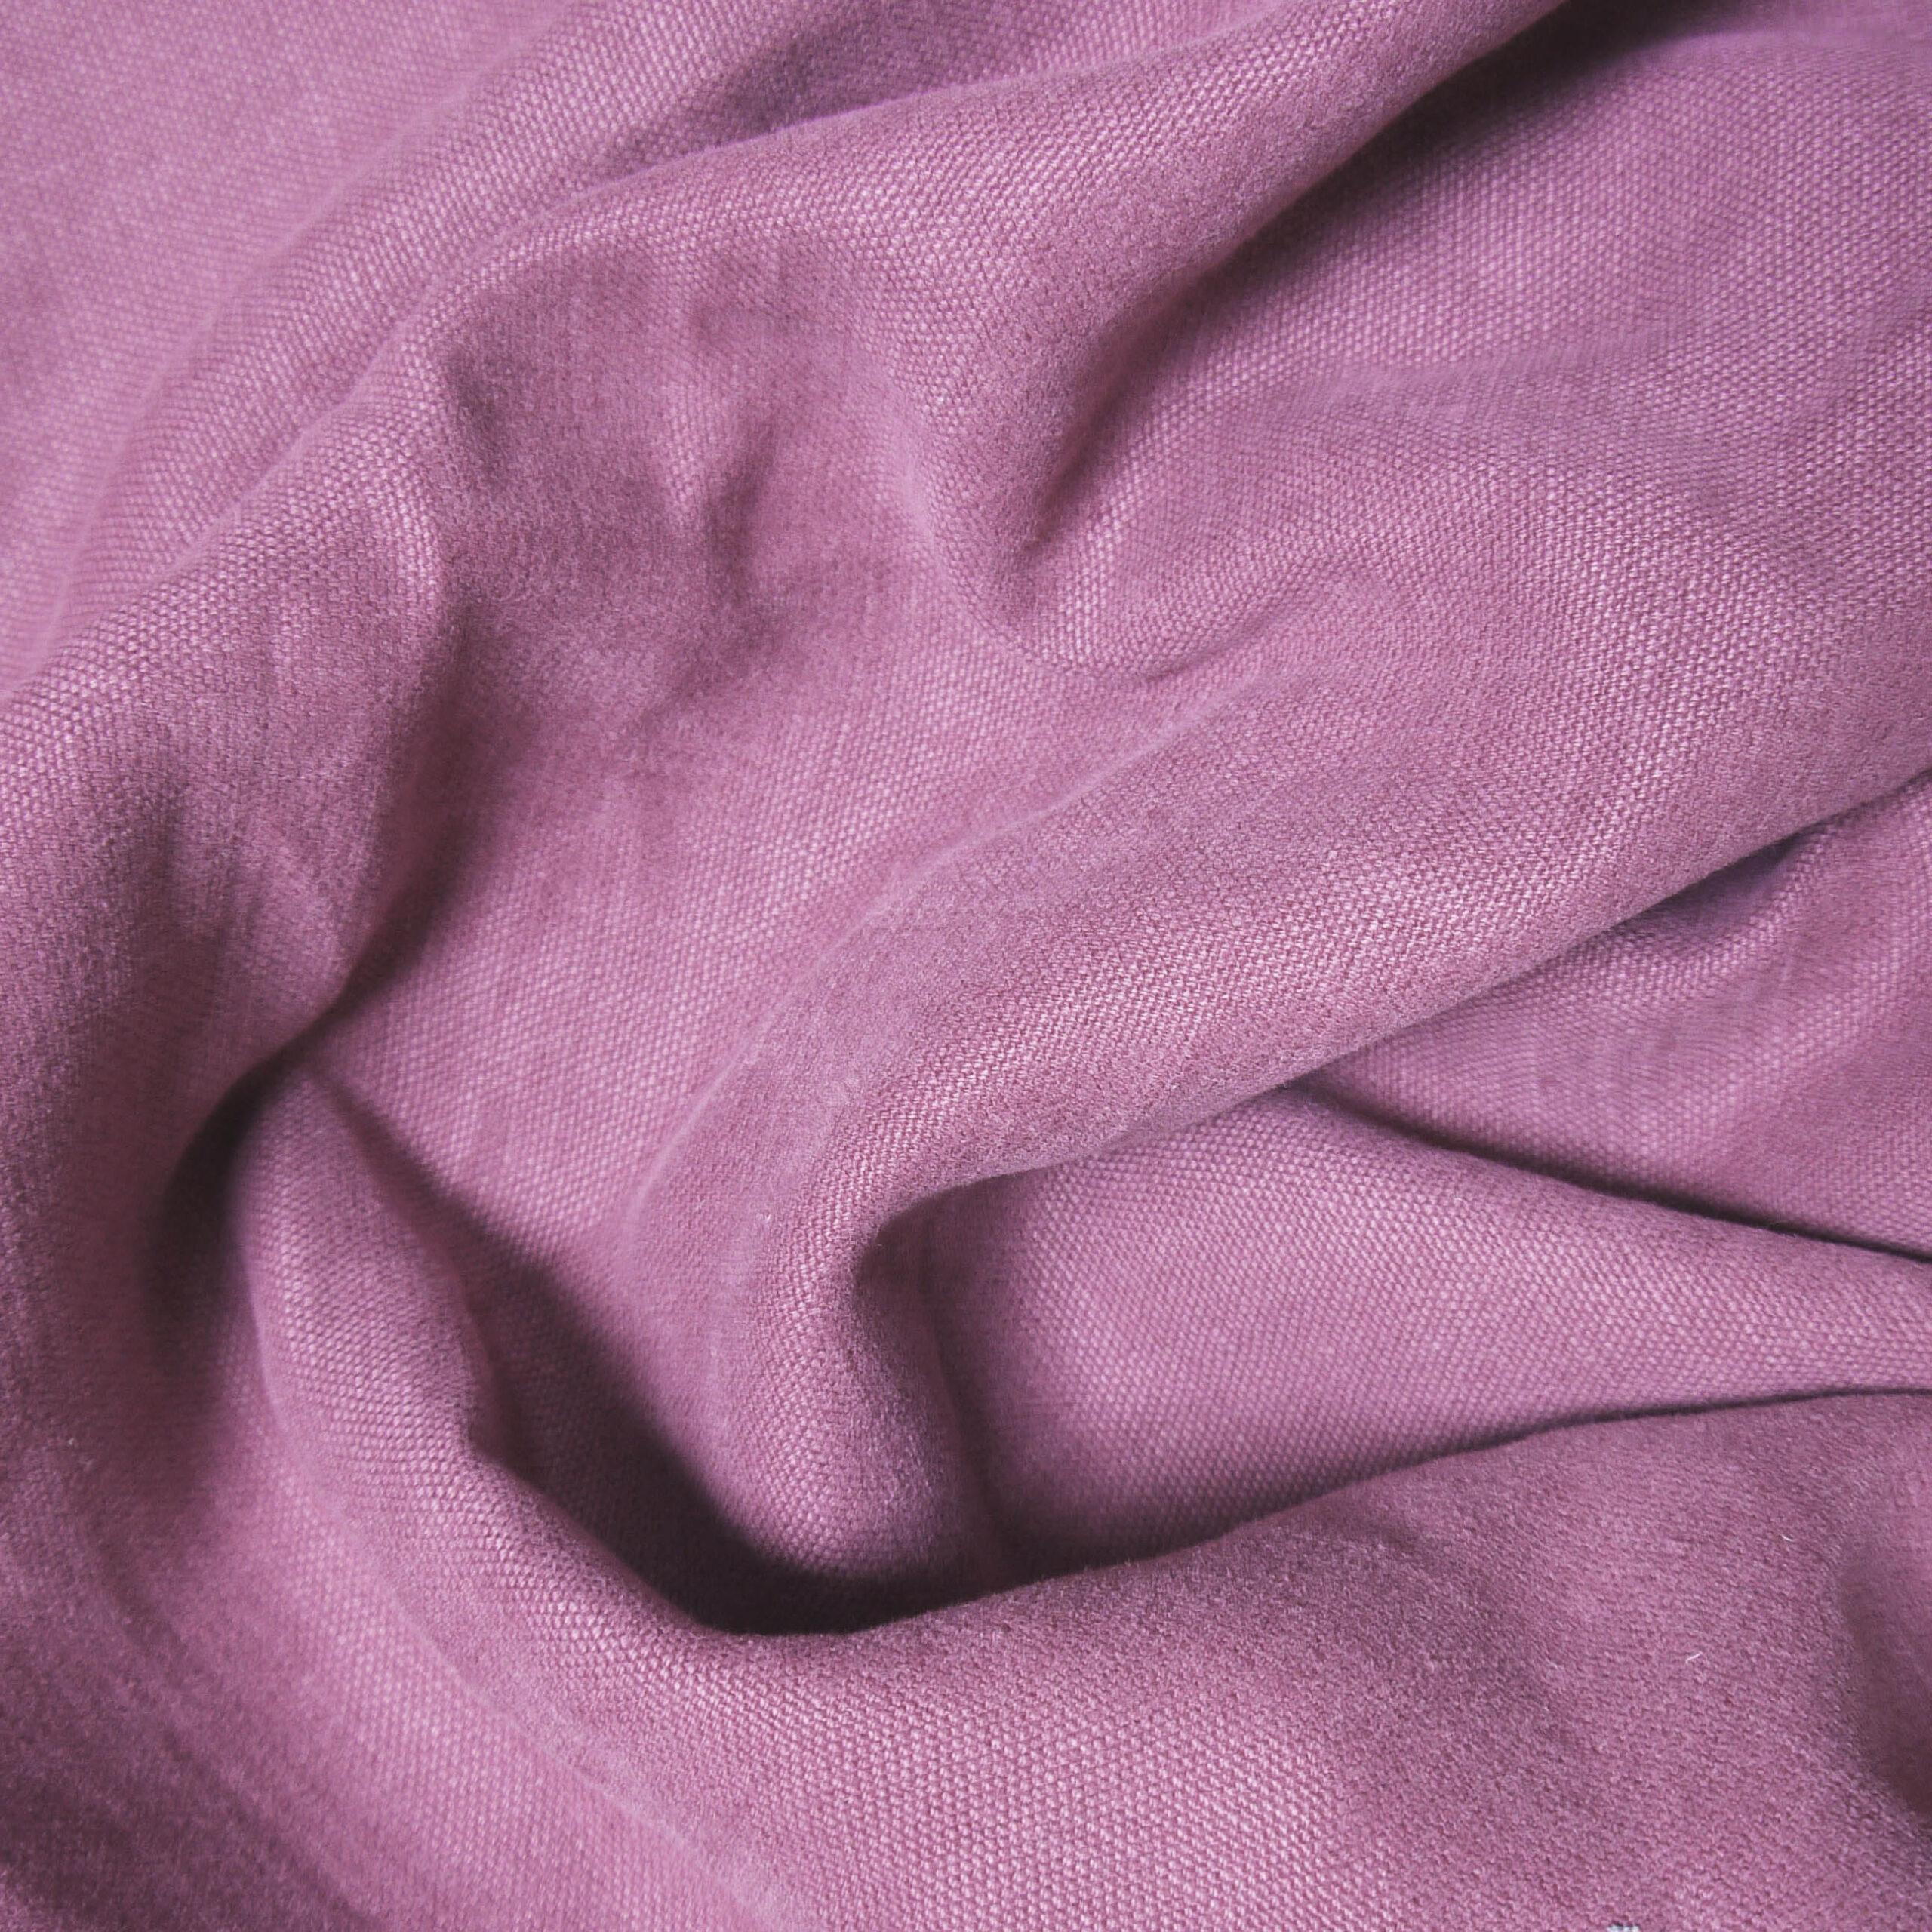 Heavy linen clover